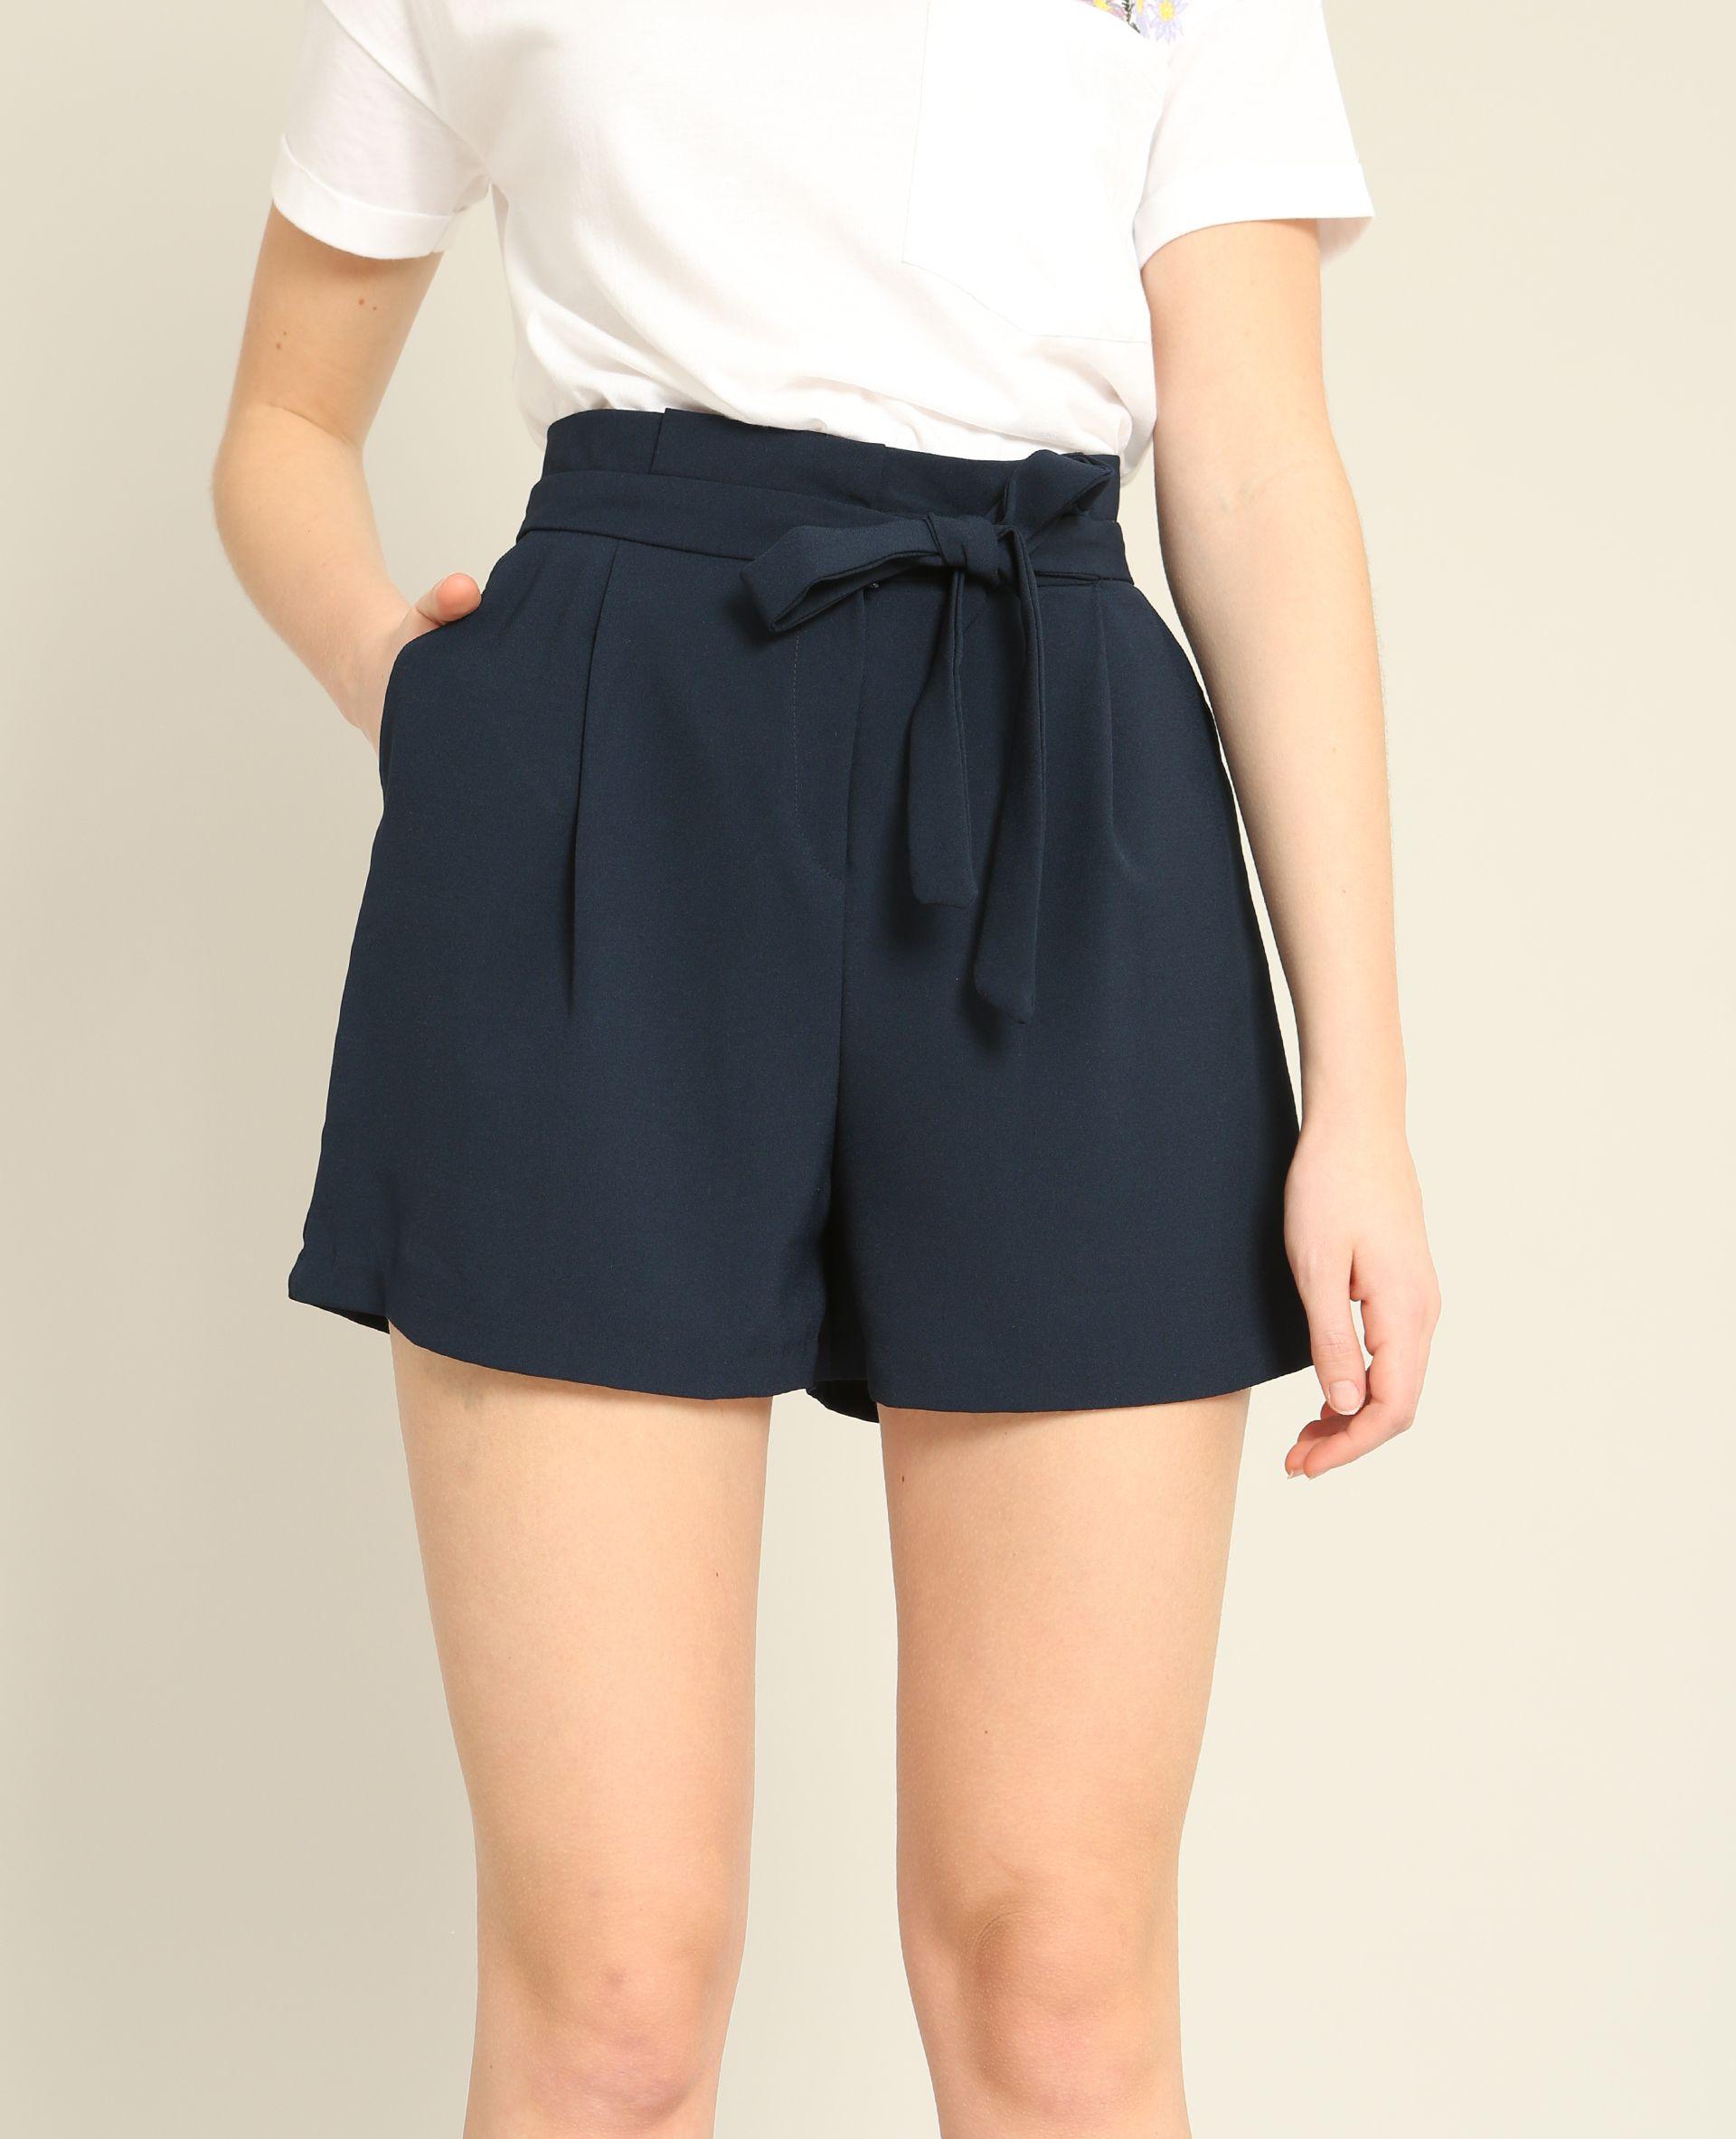 d19236f56 Shorts vaporosos azul marino | shorts y pantalones en 2019 | Uñas ...